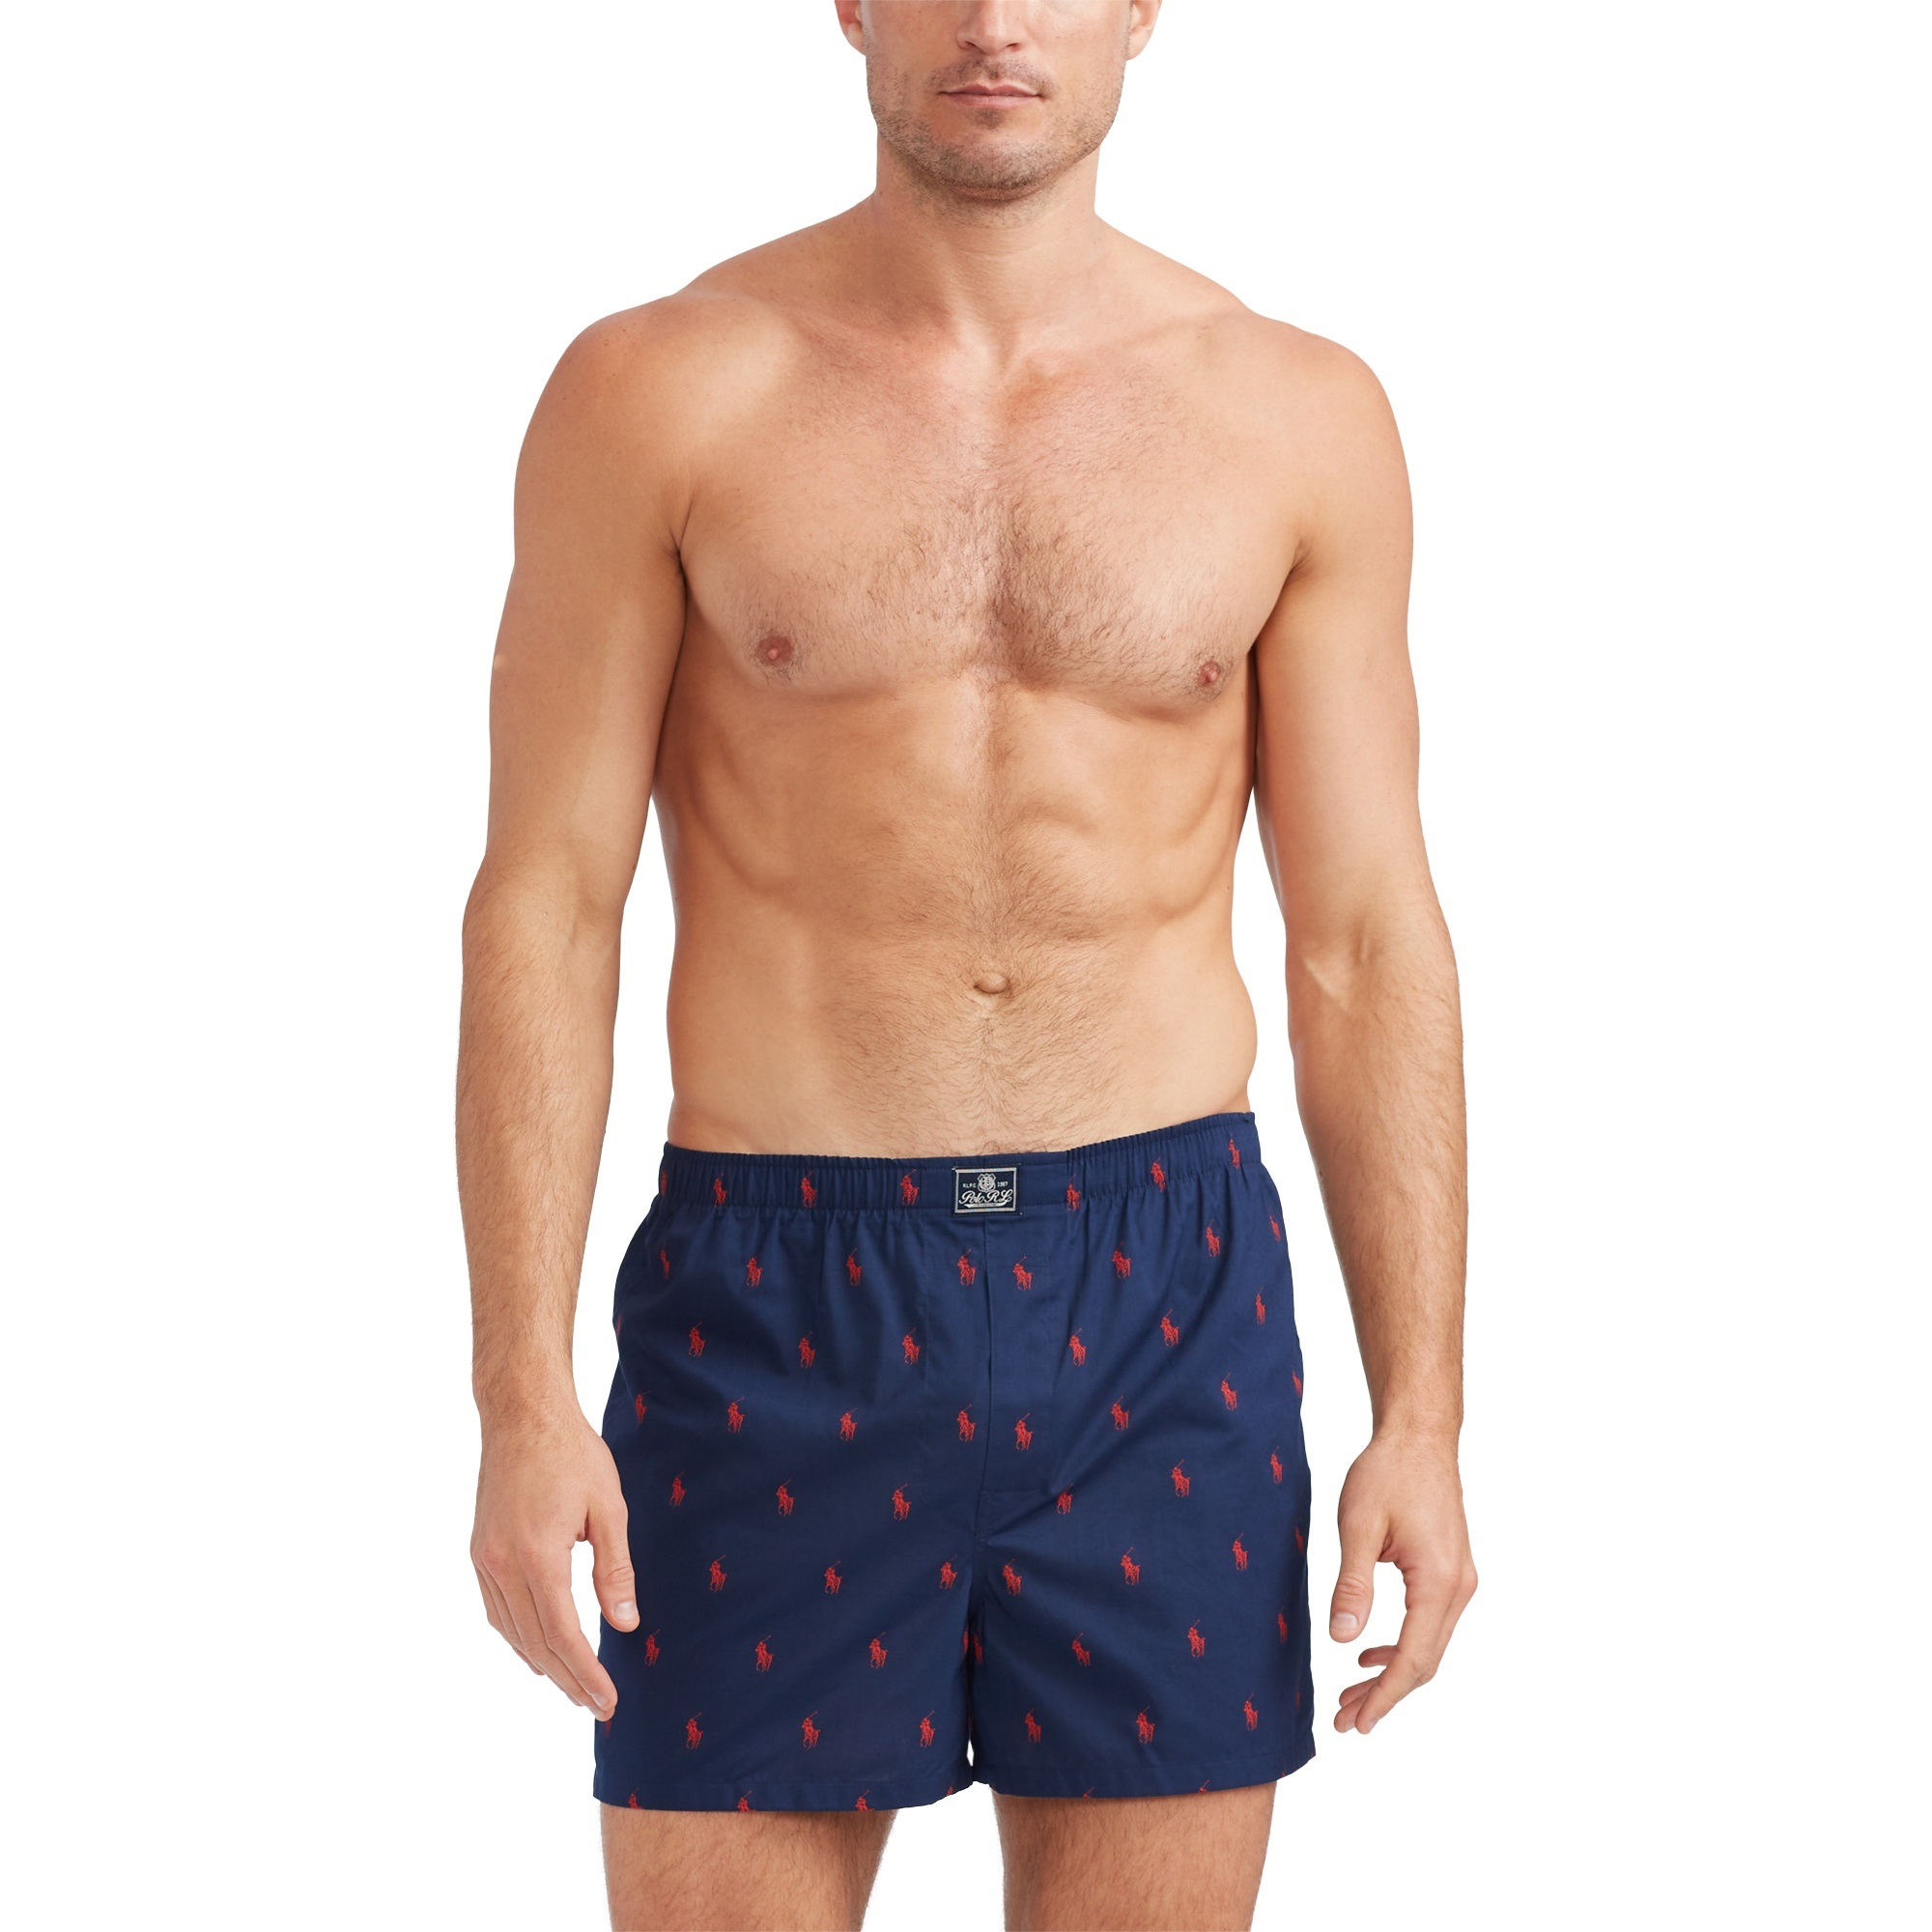 Ralph Lauren 3-pak boxershorts, mad strp/jms pld/crs nvy, large